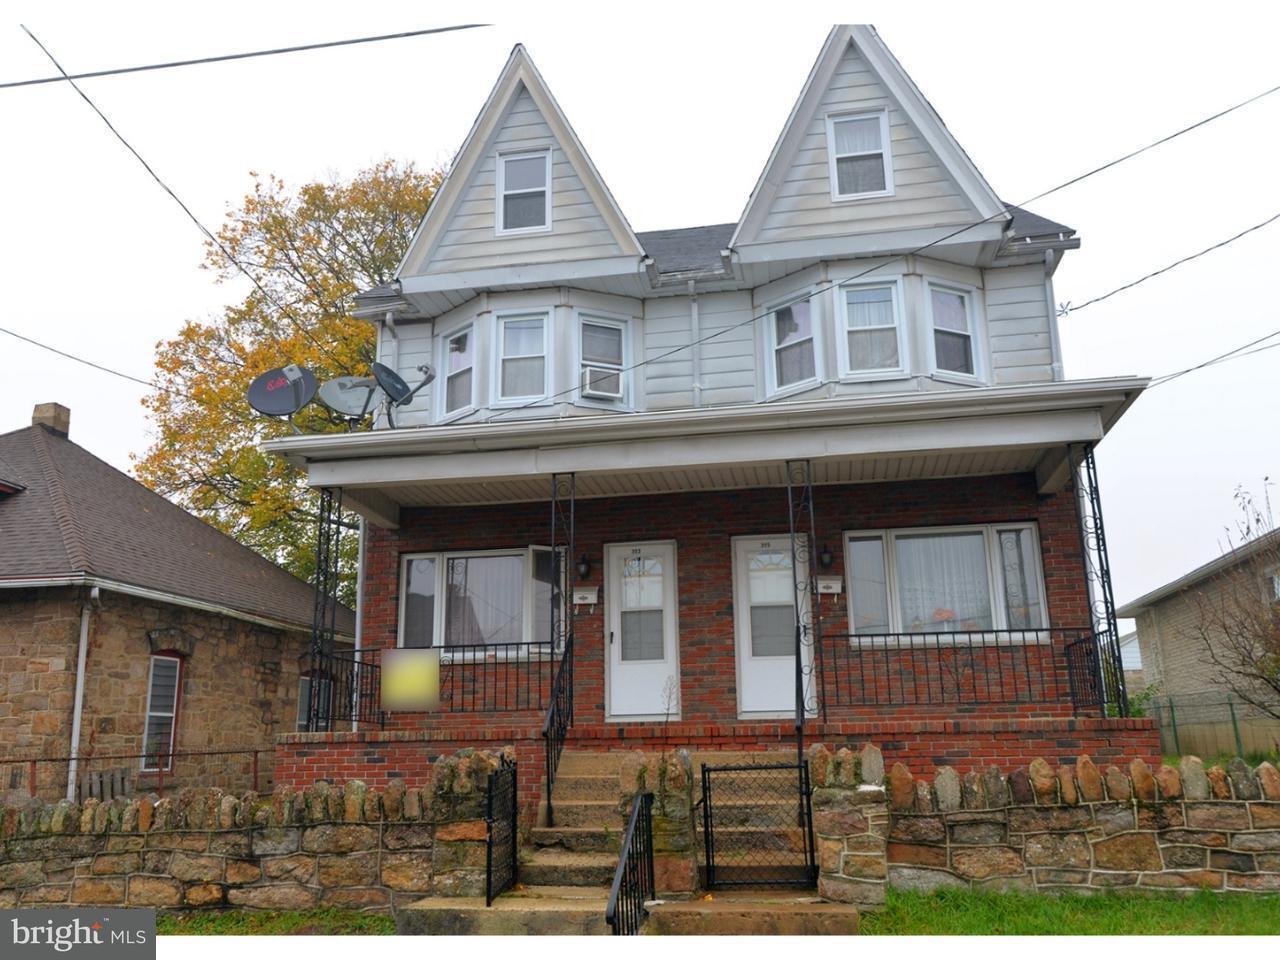 Townhouse for Sale at 303 S NICE Street Frackville, Pennsylvania 17931 United States